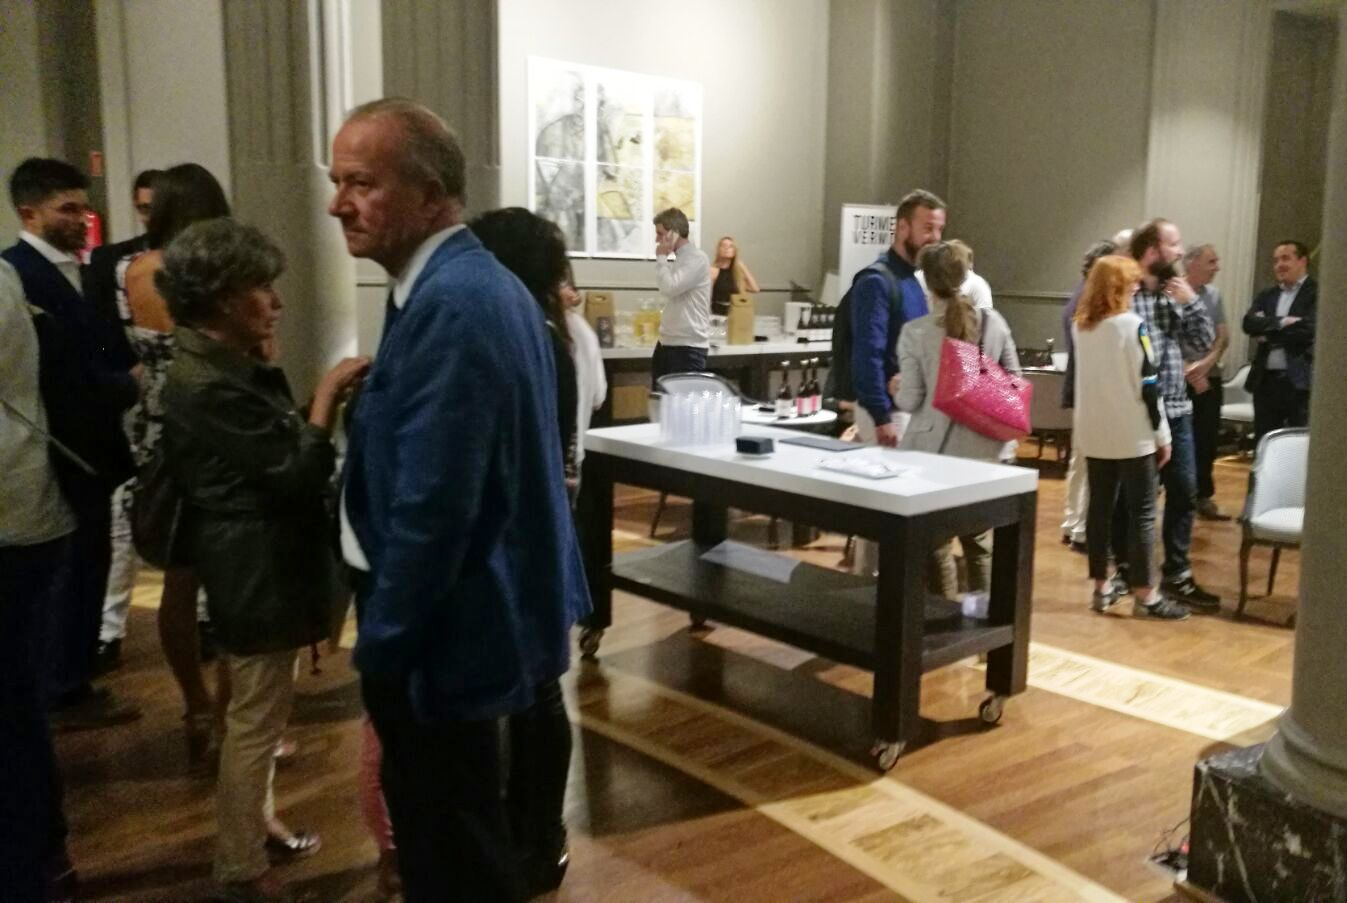 Descubriendo Zaragoza: De Sitio en Sitio en Zaragoza